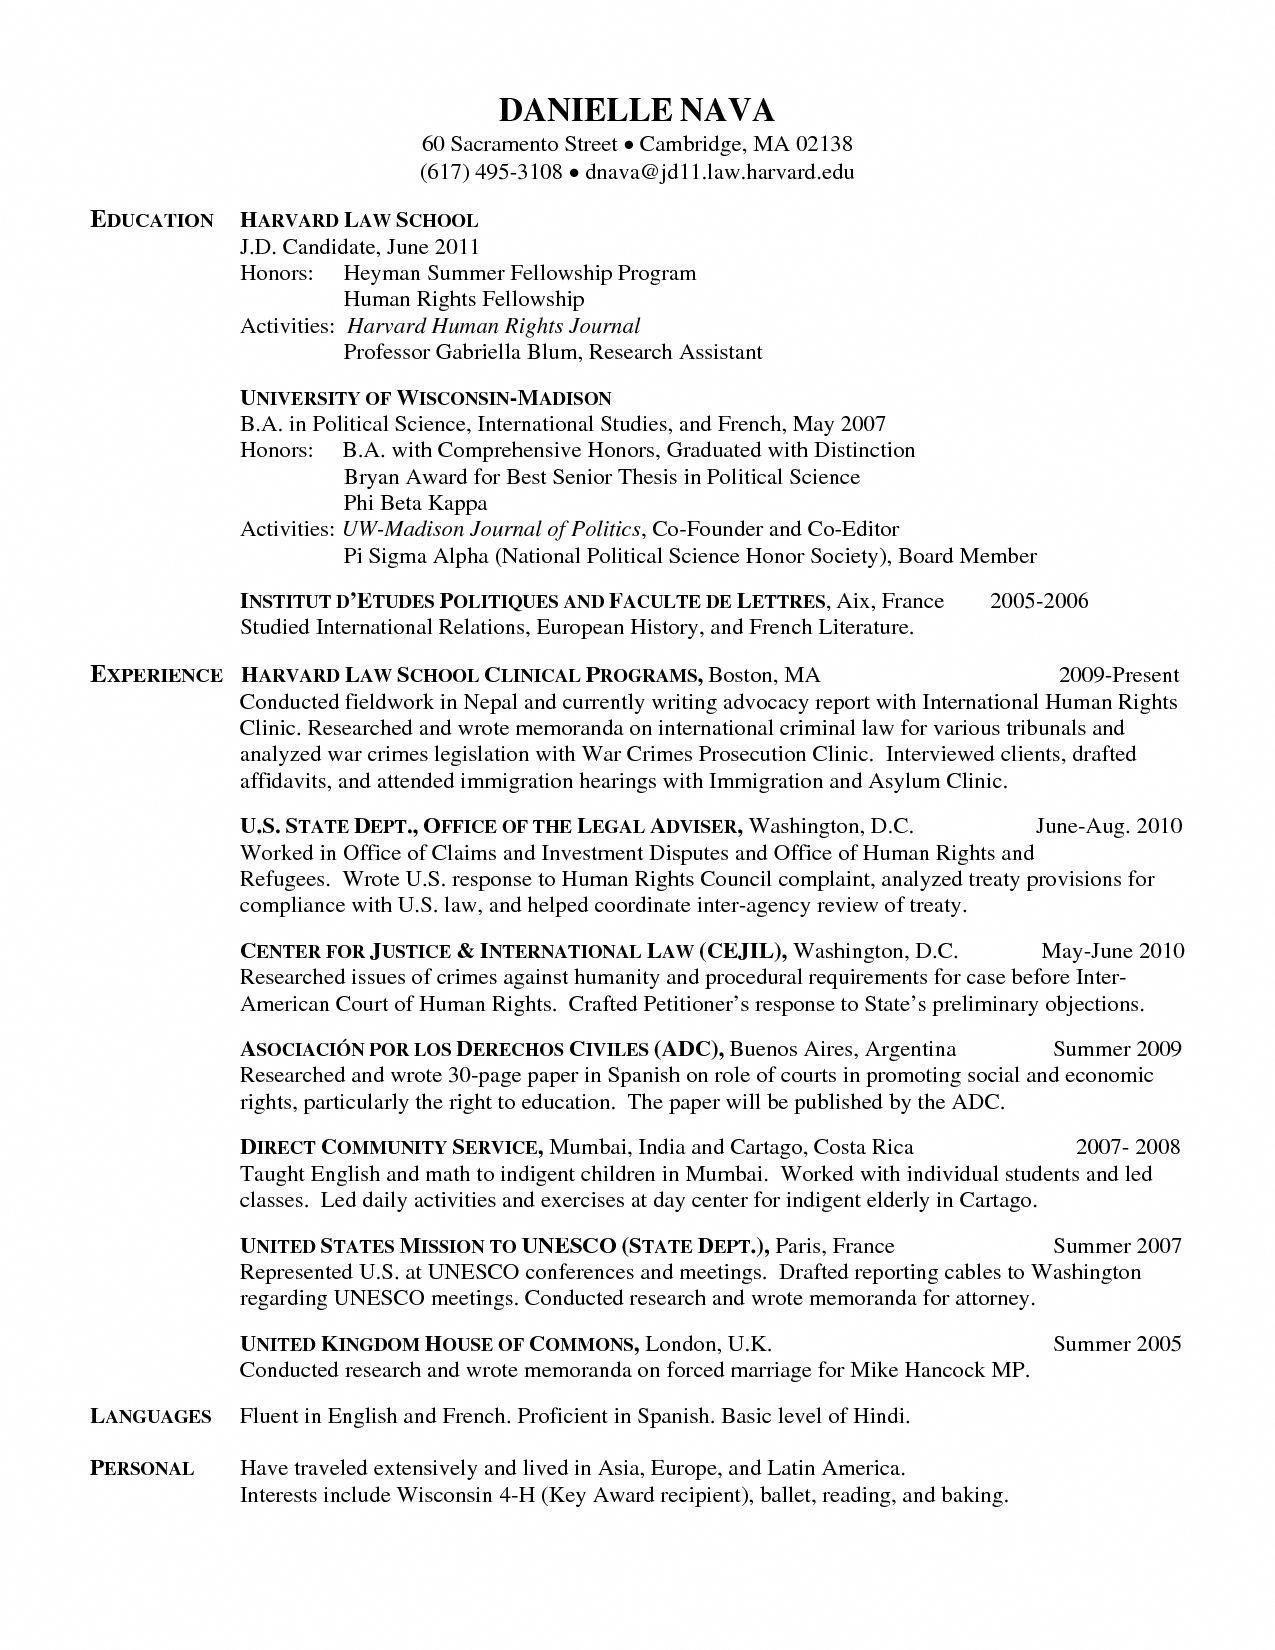 Buy college admissions essay example harvard - FREE 30+ College